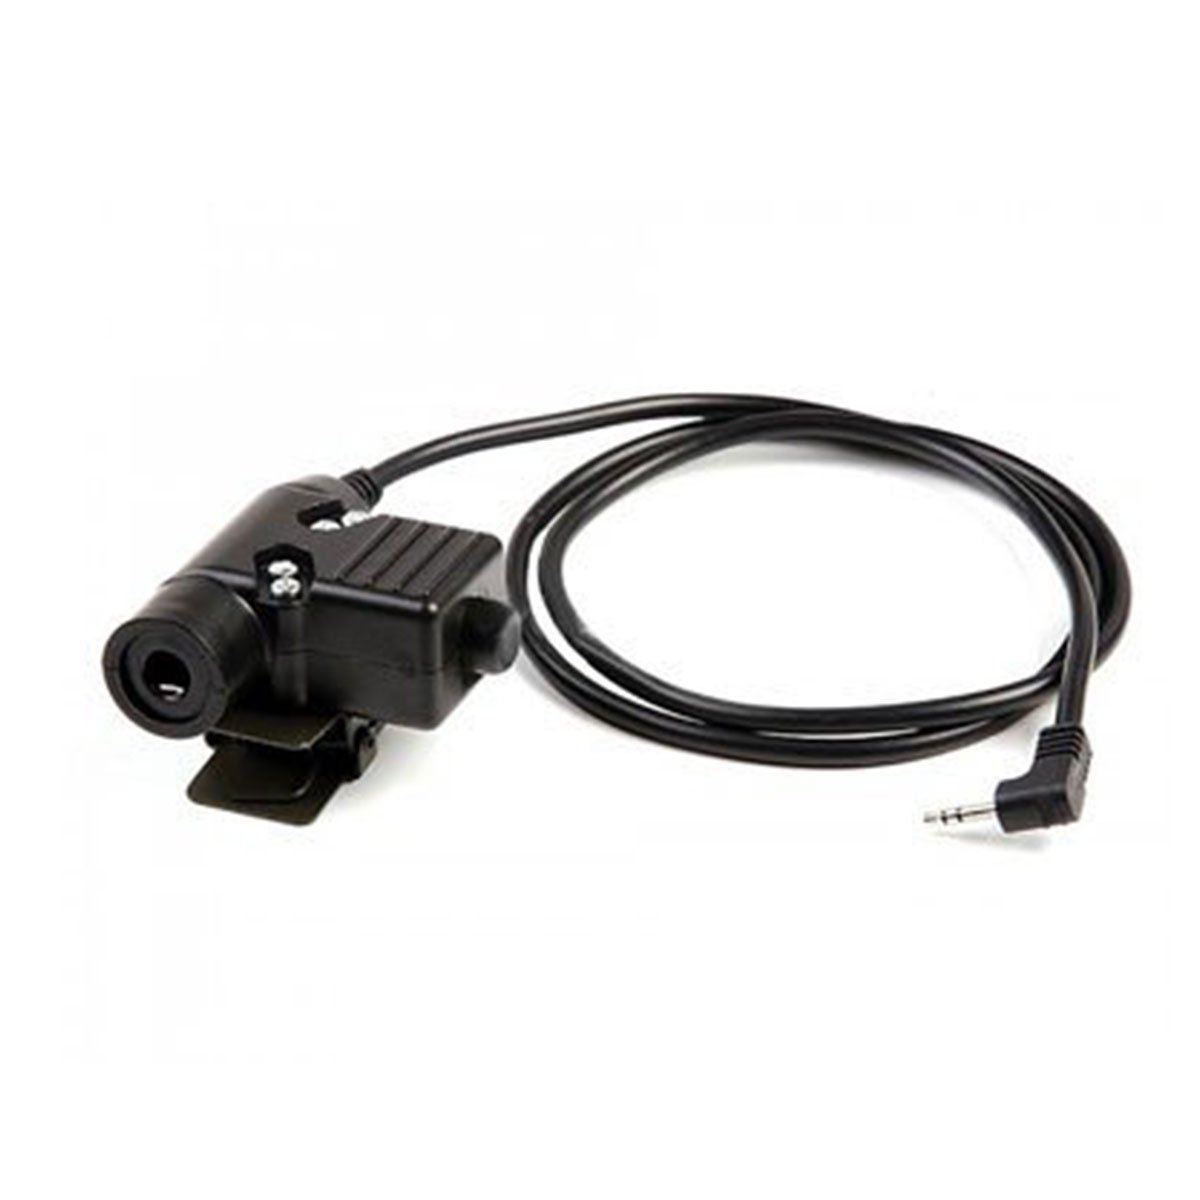 Chave Interruptor Para Microfone/radio Comunicador Motorola Z113-m1 Zu94 Ptt Military Standard Version